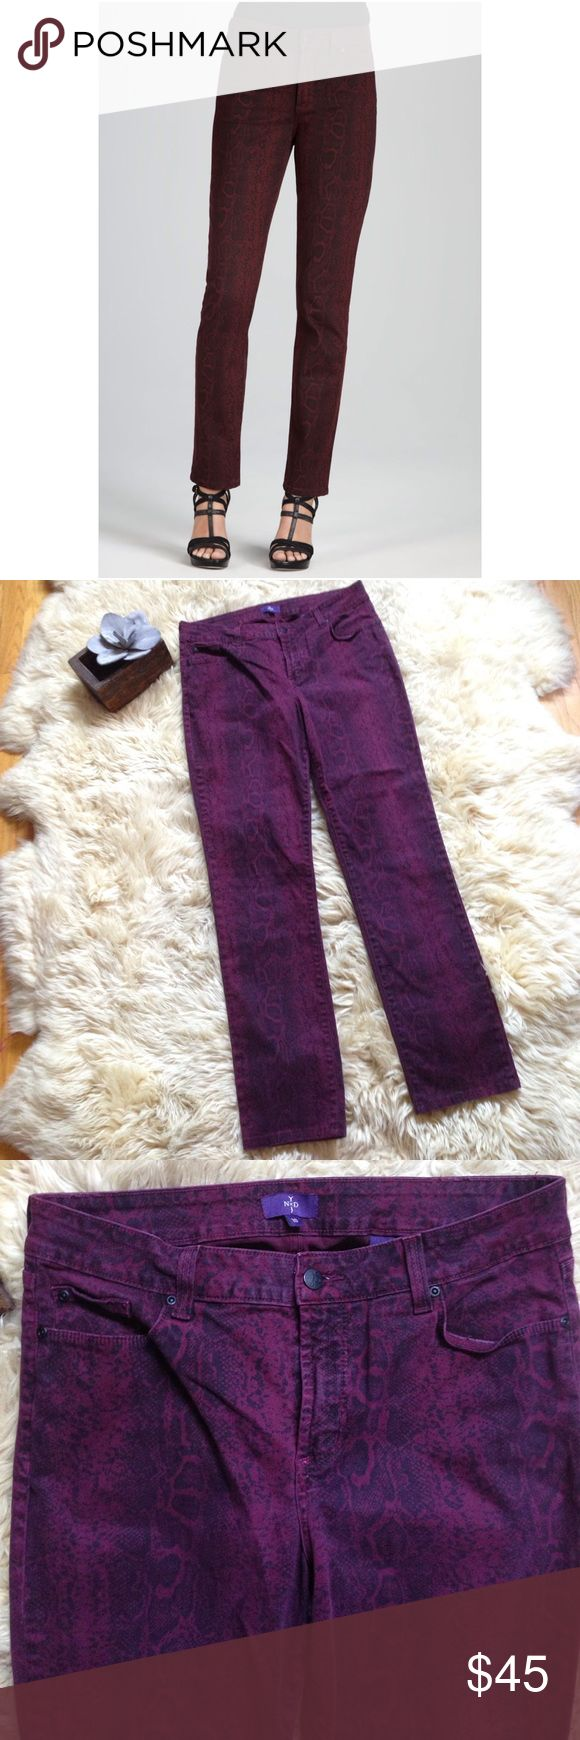 NYDJ Python Print Skinny Pants NYDJ Python Print Skinny Jeans. Dark purple with gray/black print. NYDJ Pants Skinny